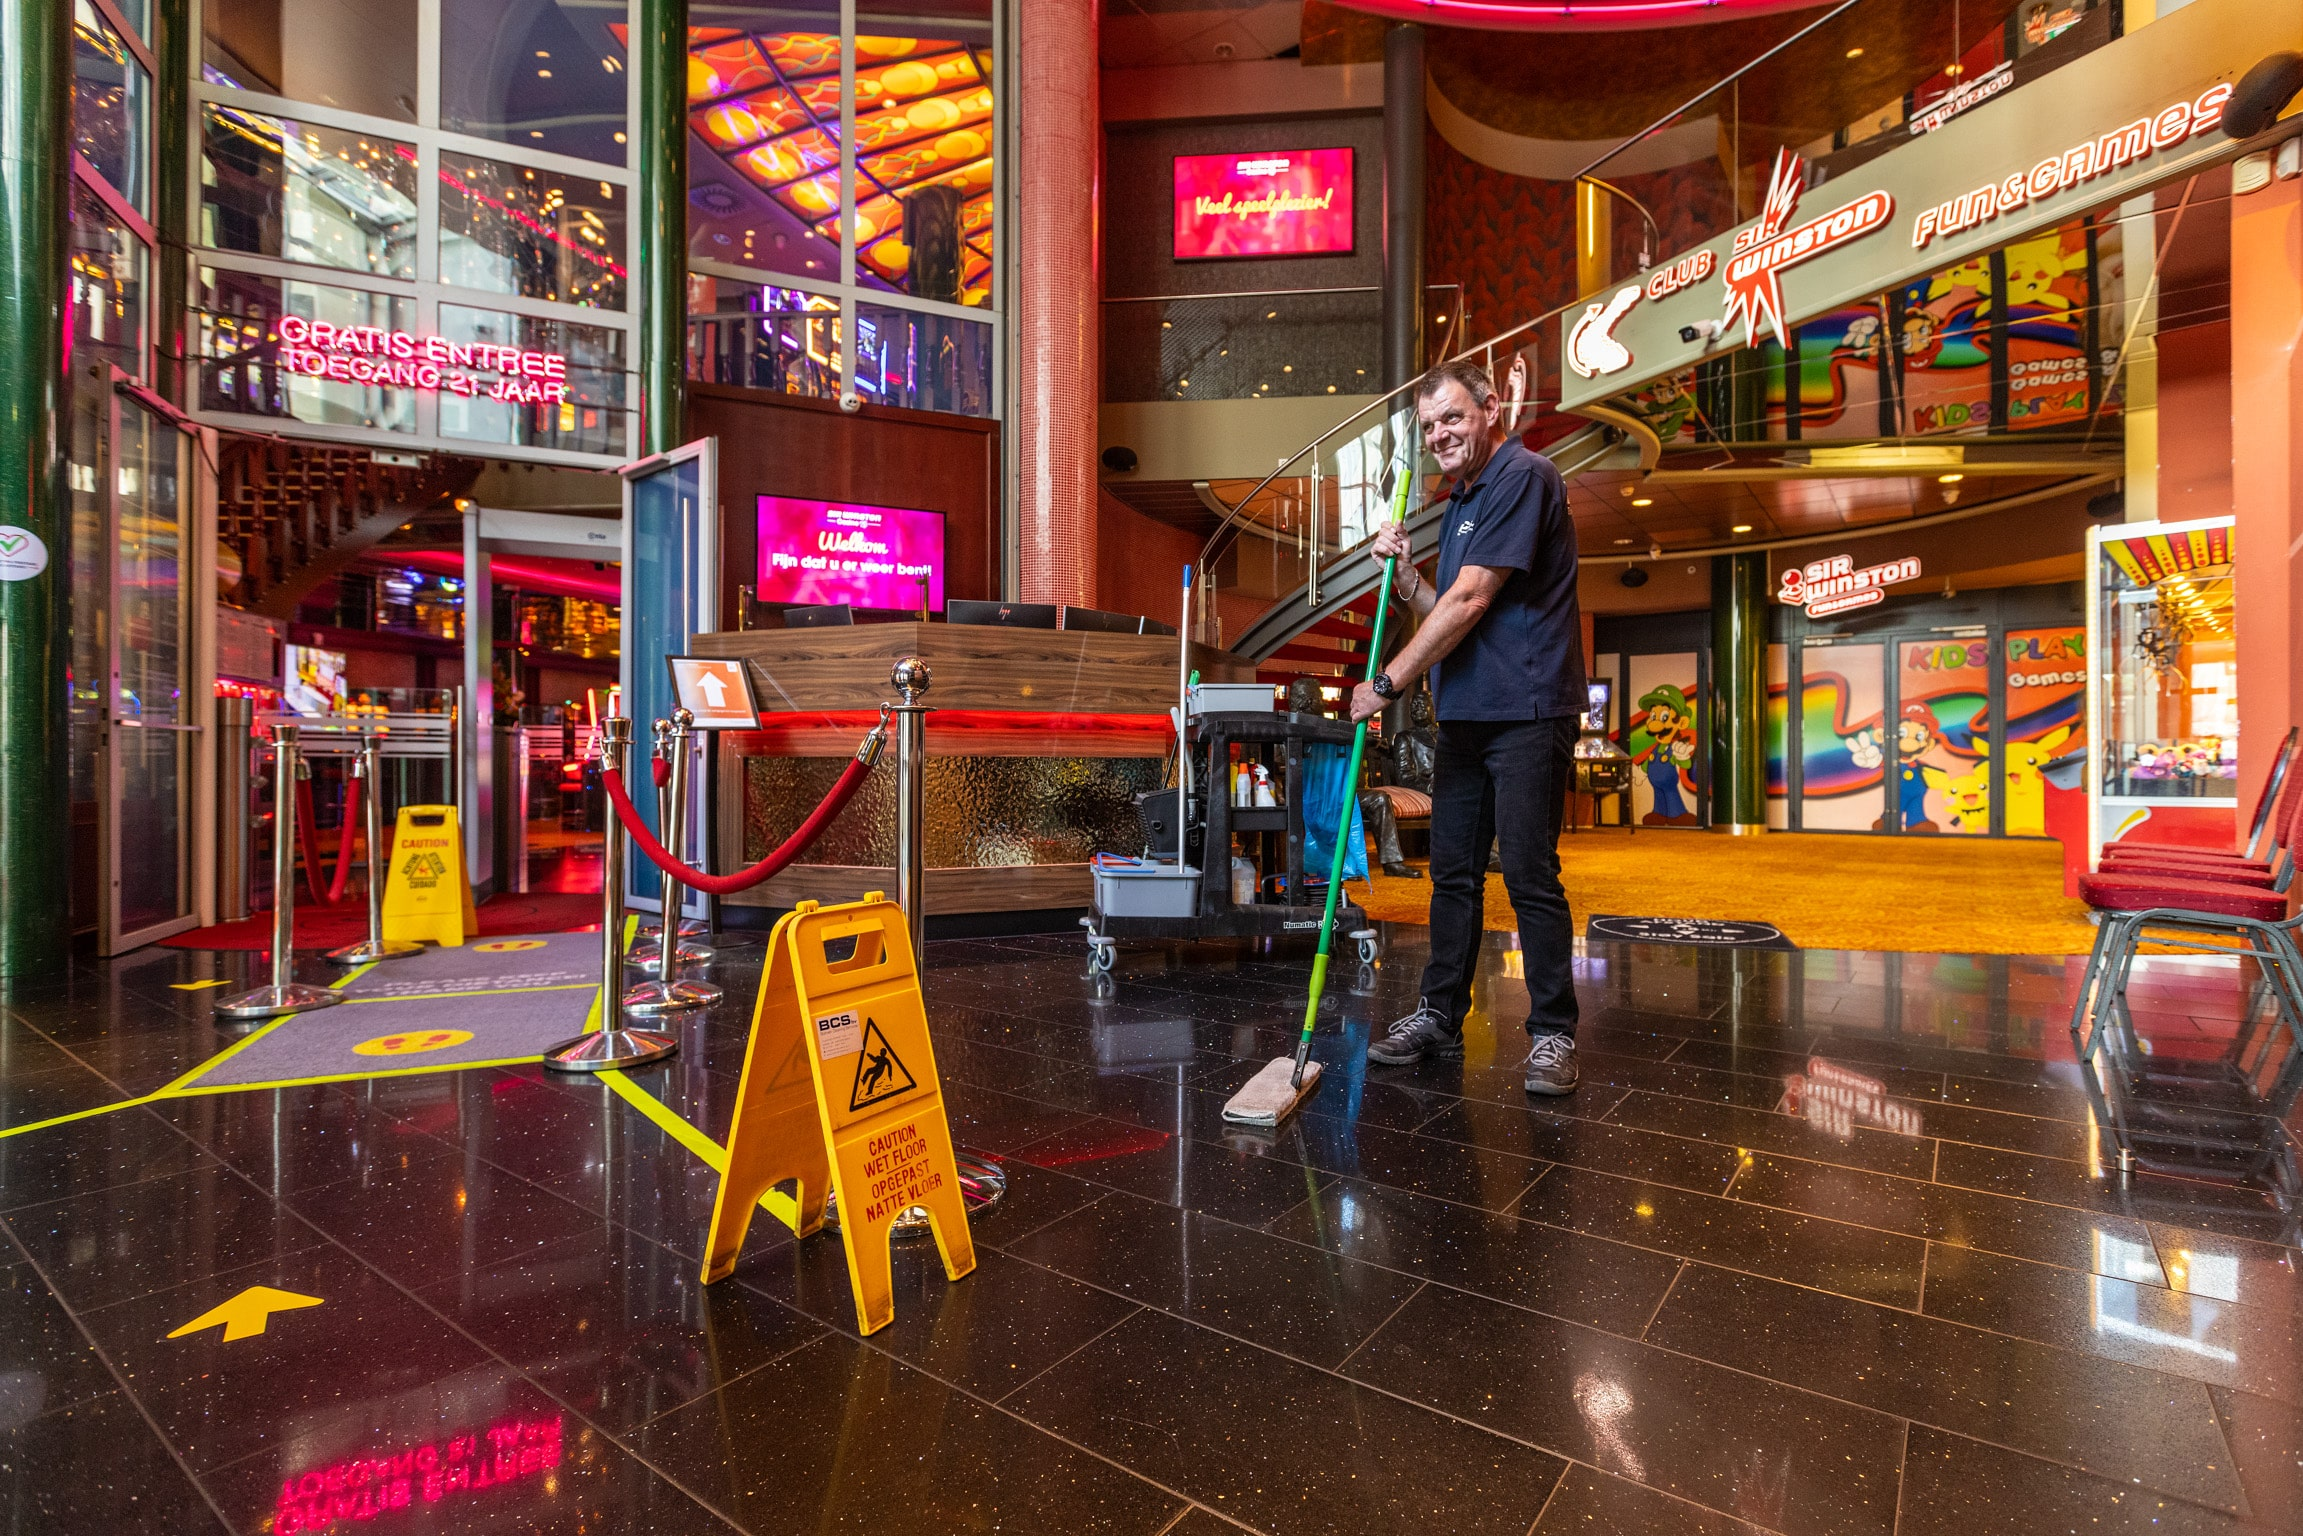 Welkomsthal bedrijfspand schoonmaken   Bolman Cleaning Services